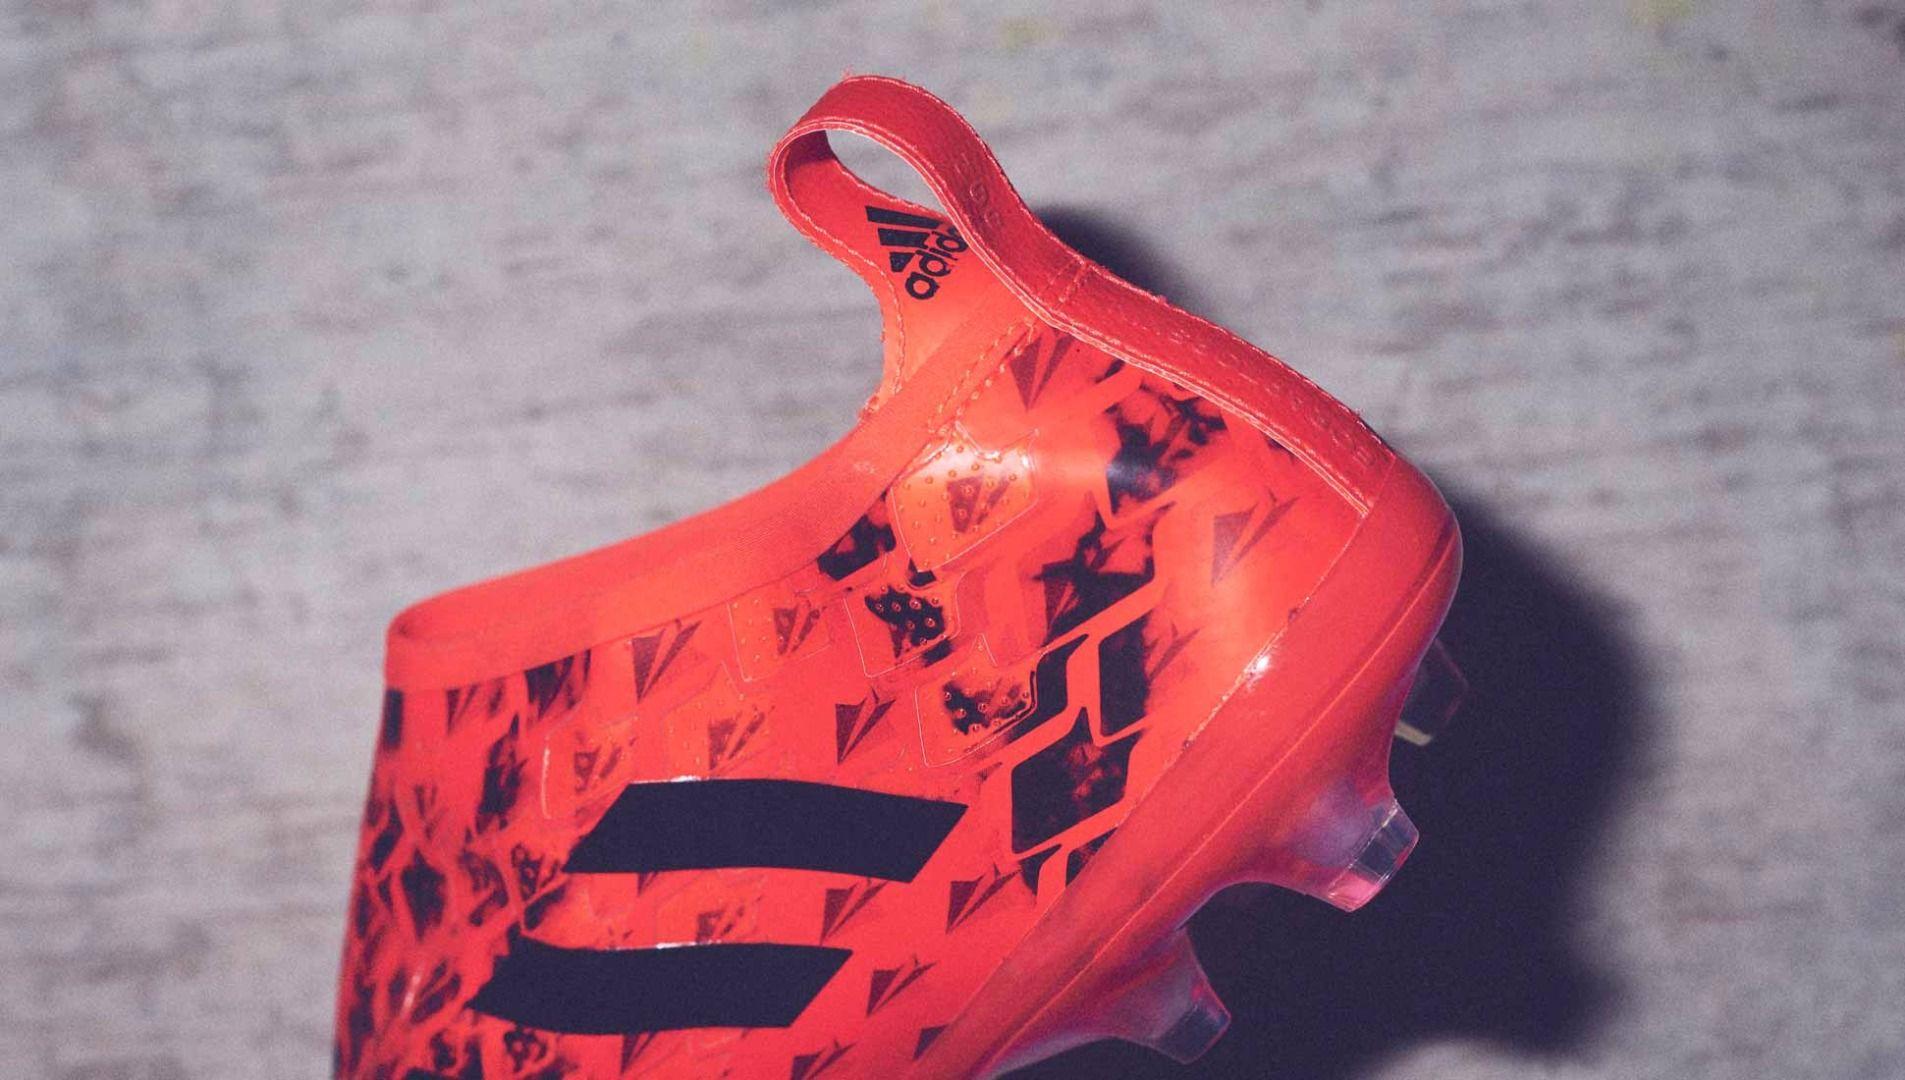 Closer Look | Football boots, Boots, Adidas